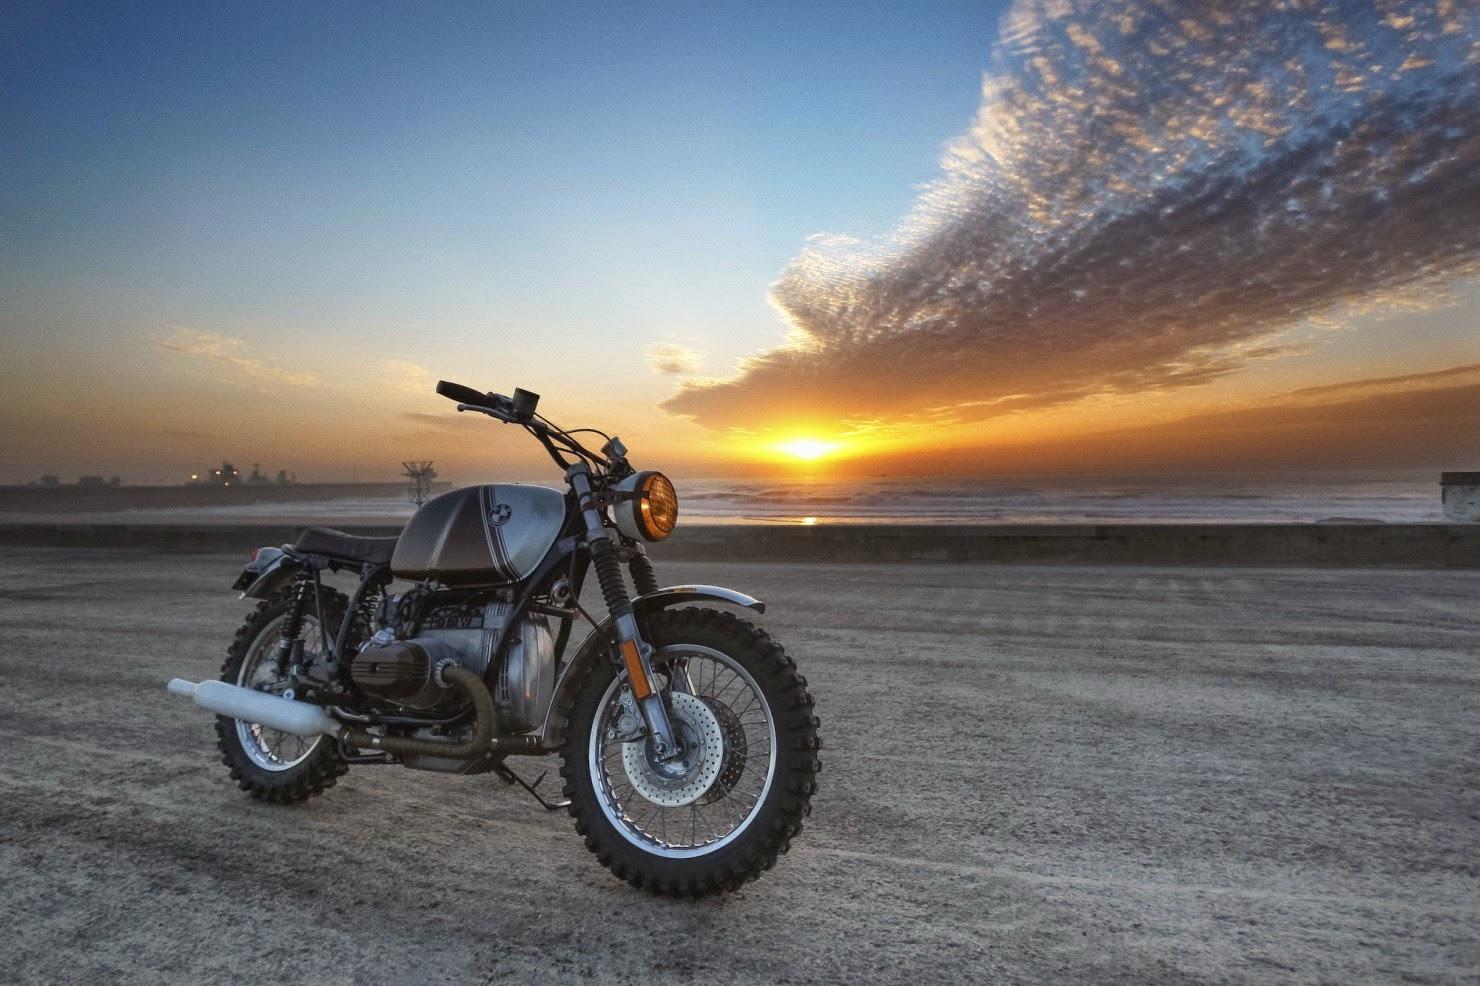 BMW-R45-Custom-Motorcycle-22-1480x986